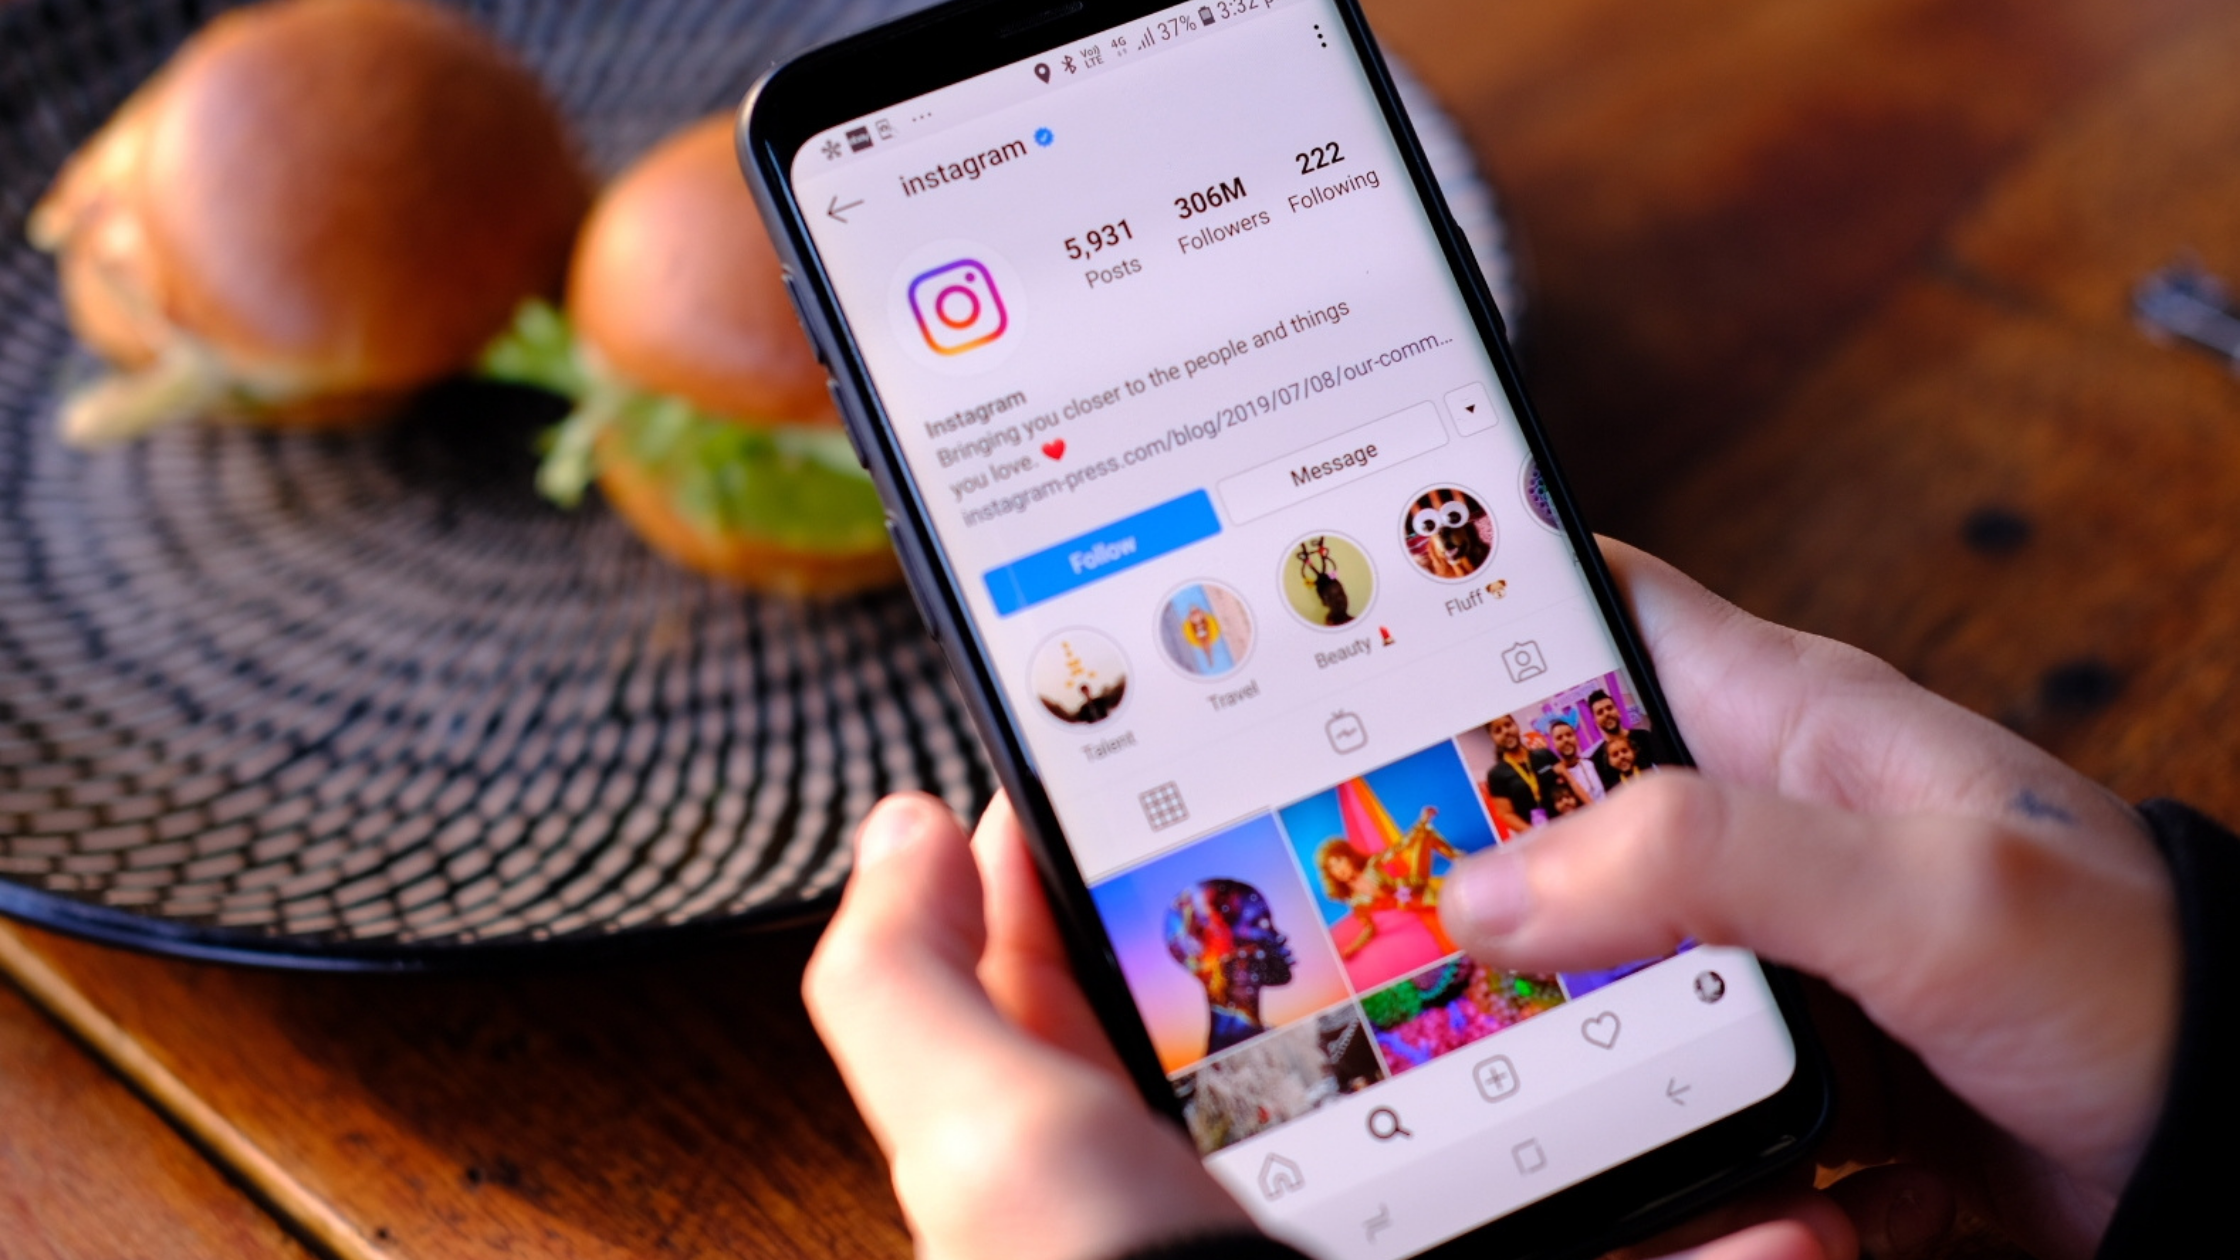 Guide Instagram usage